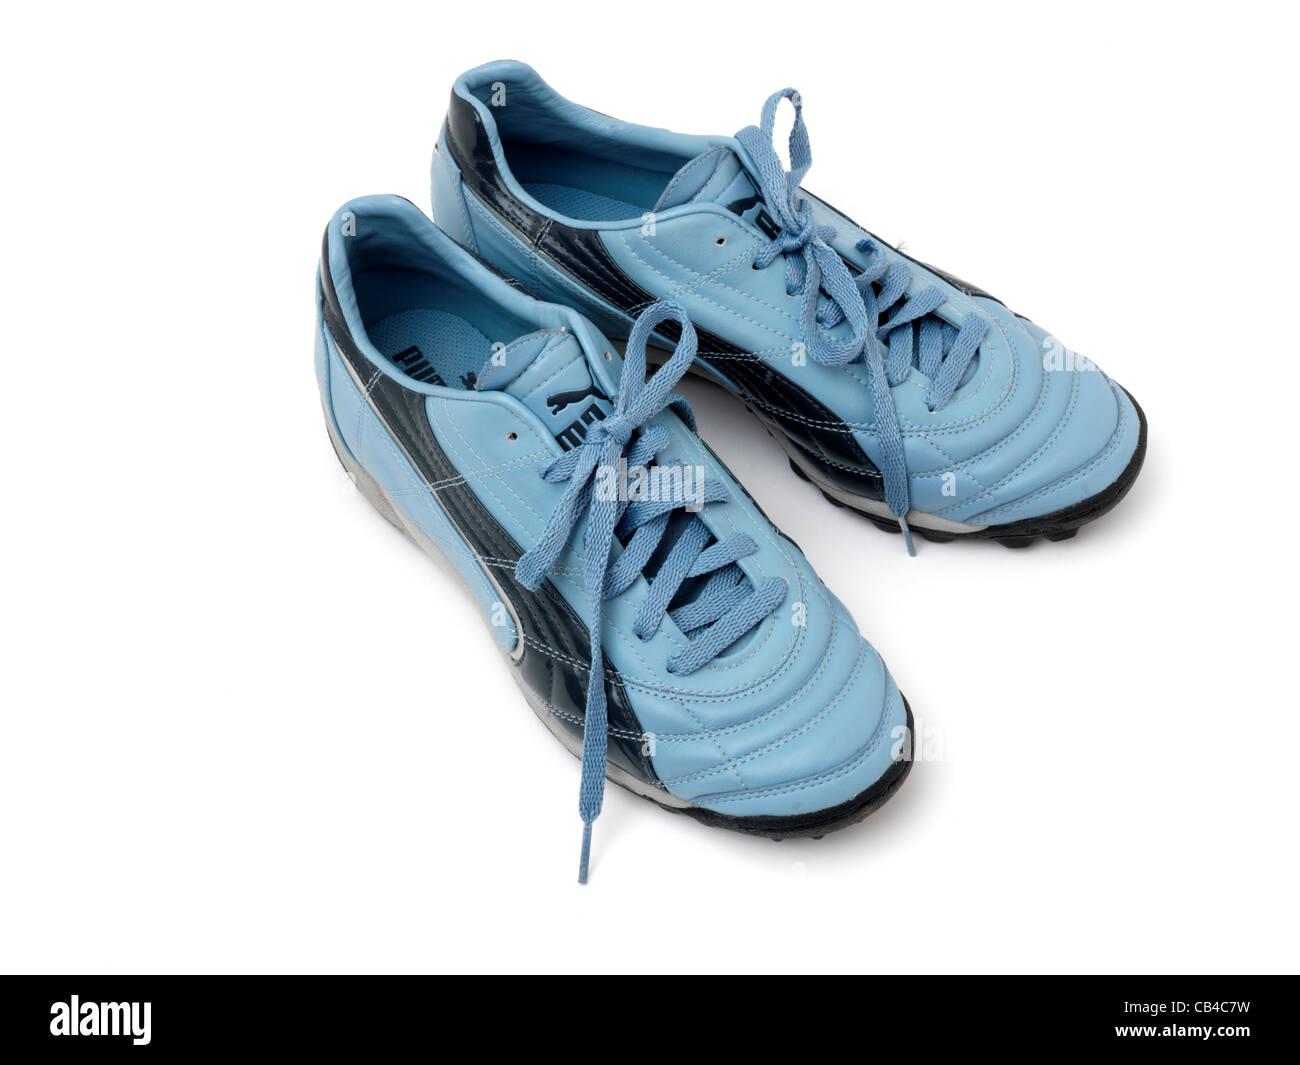 Puma Shoes High Resolution Stock